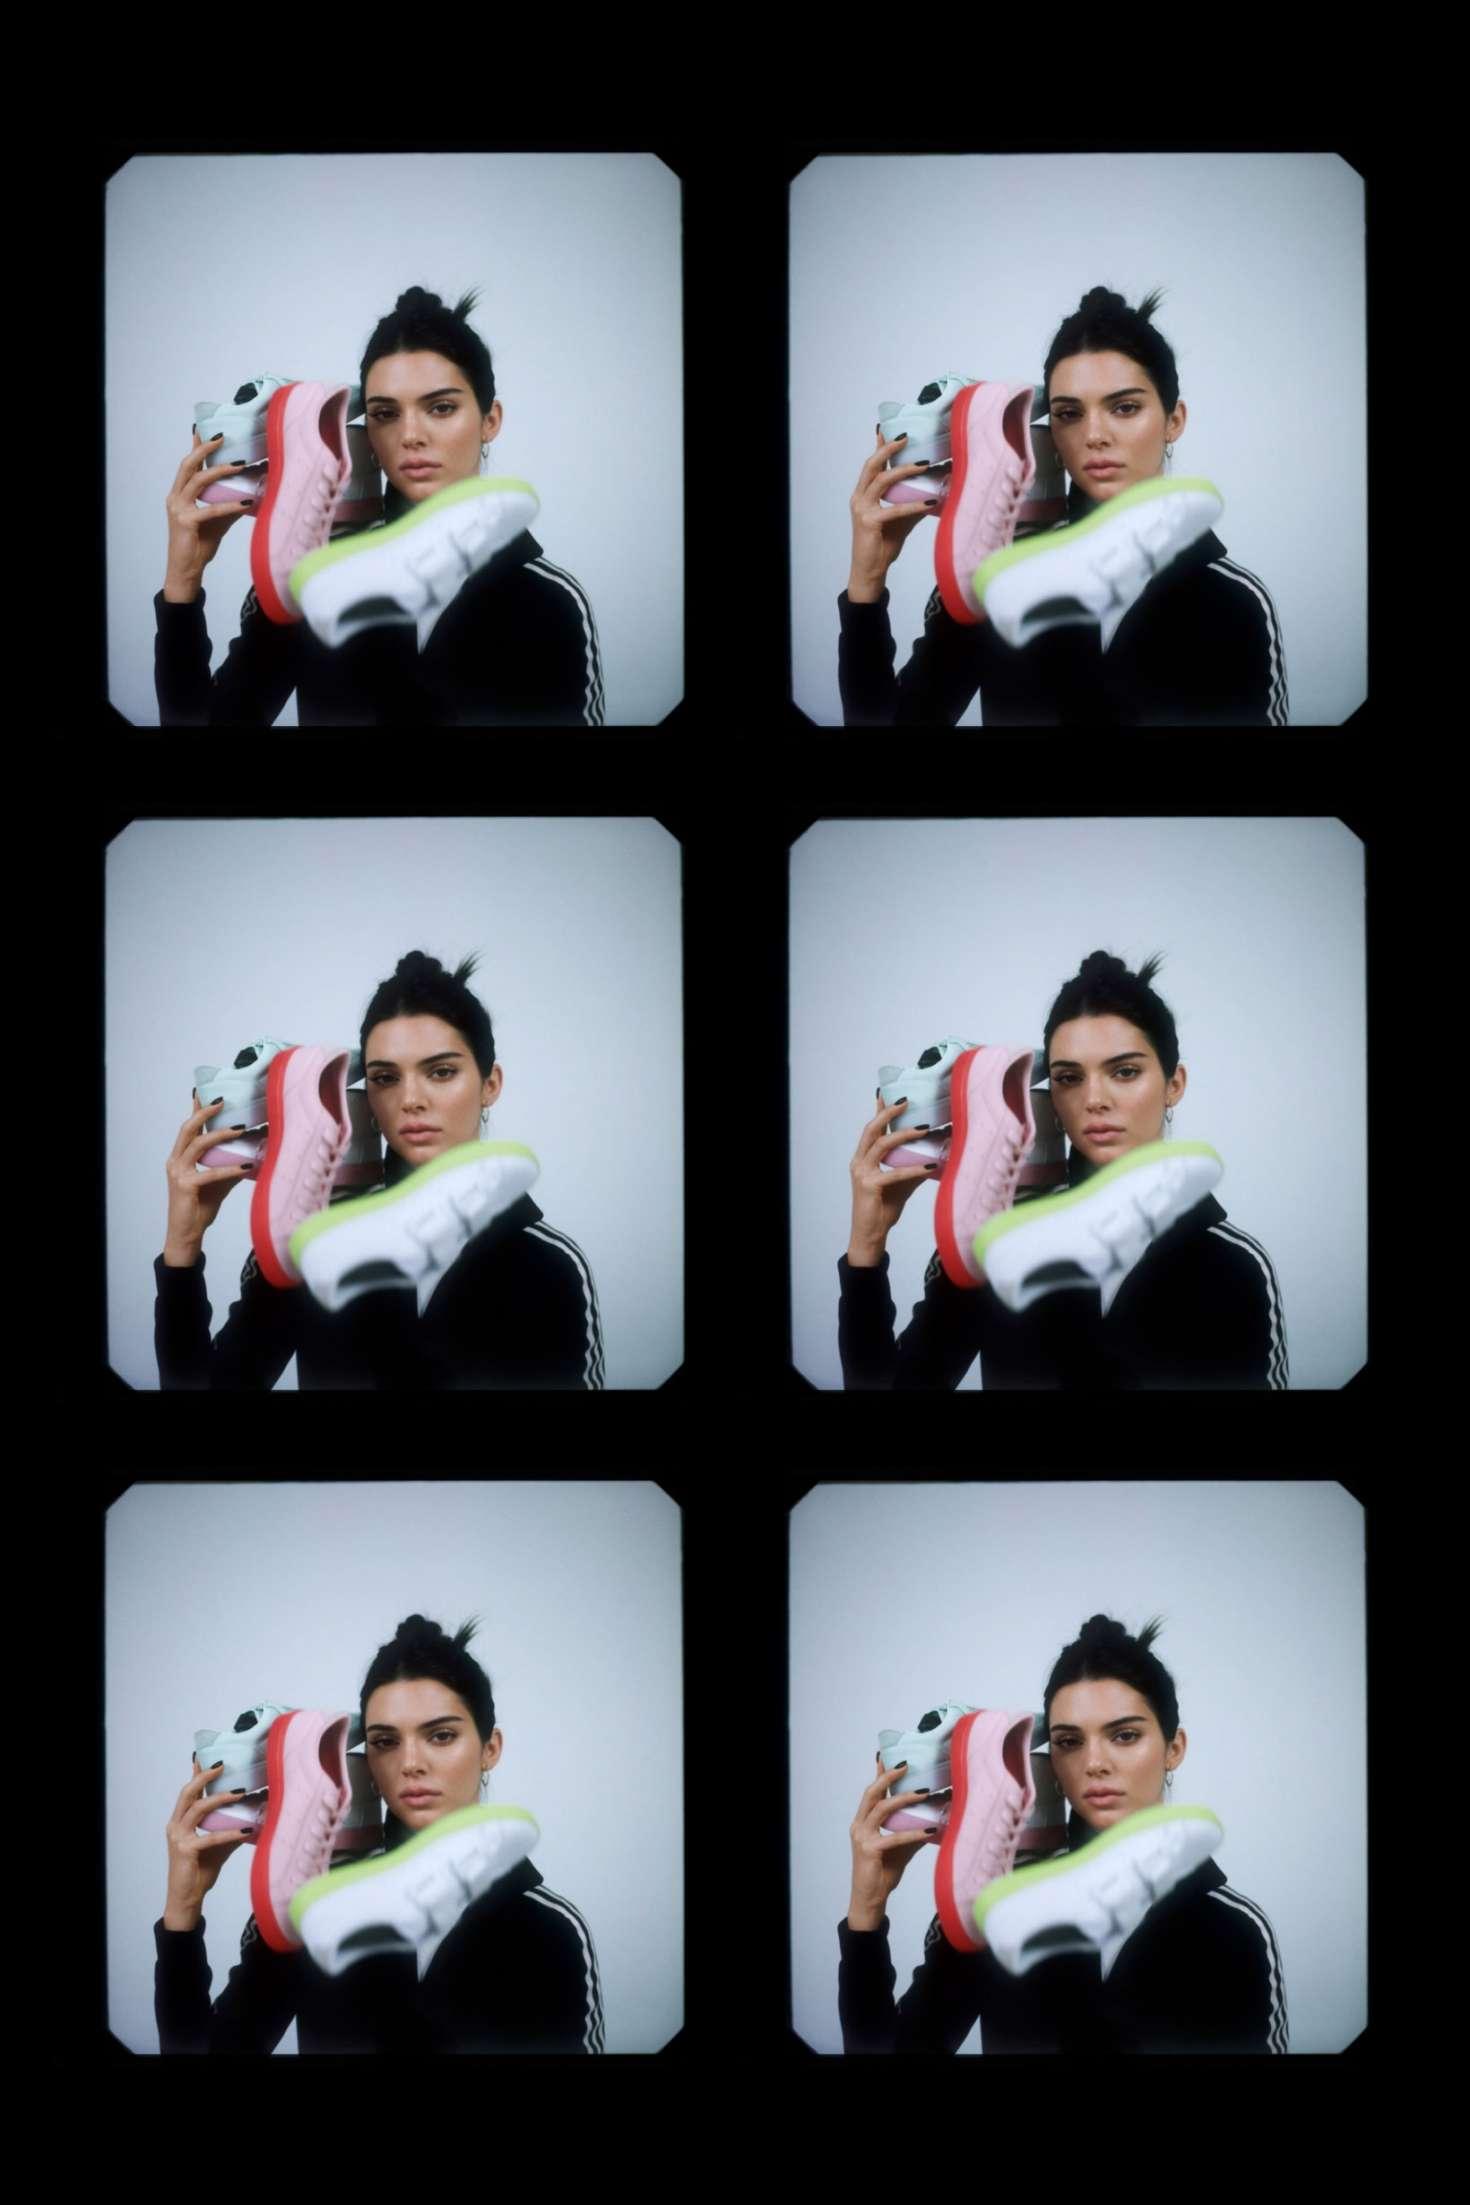 Kendall Jenner 2019 : Kendall Jenner: Adidas New Sleek Lookbook 2019 Collection -12